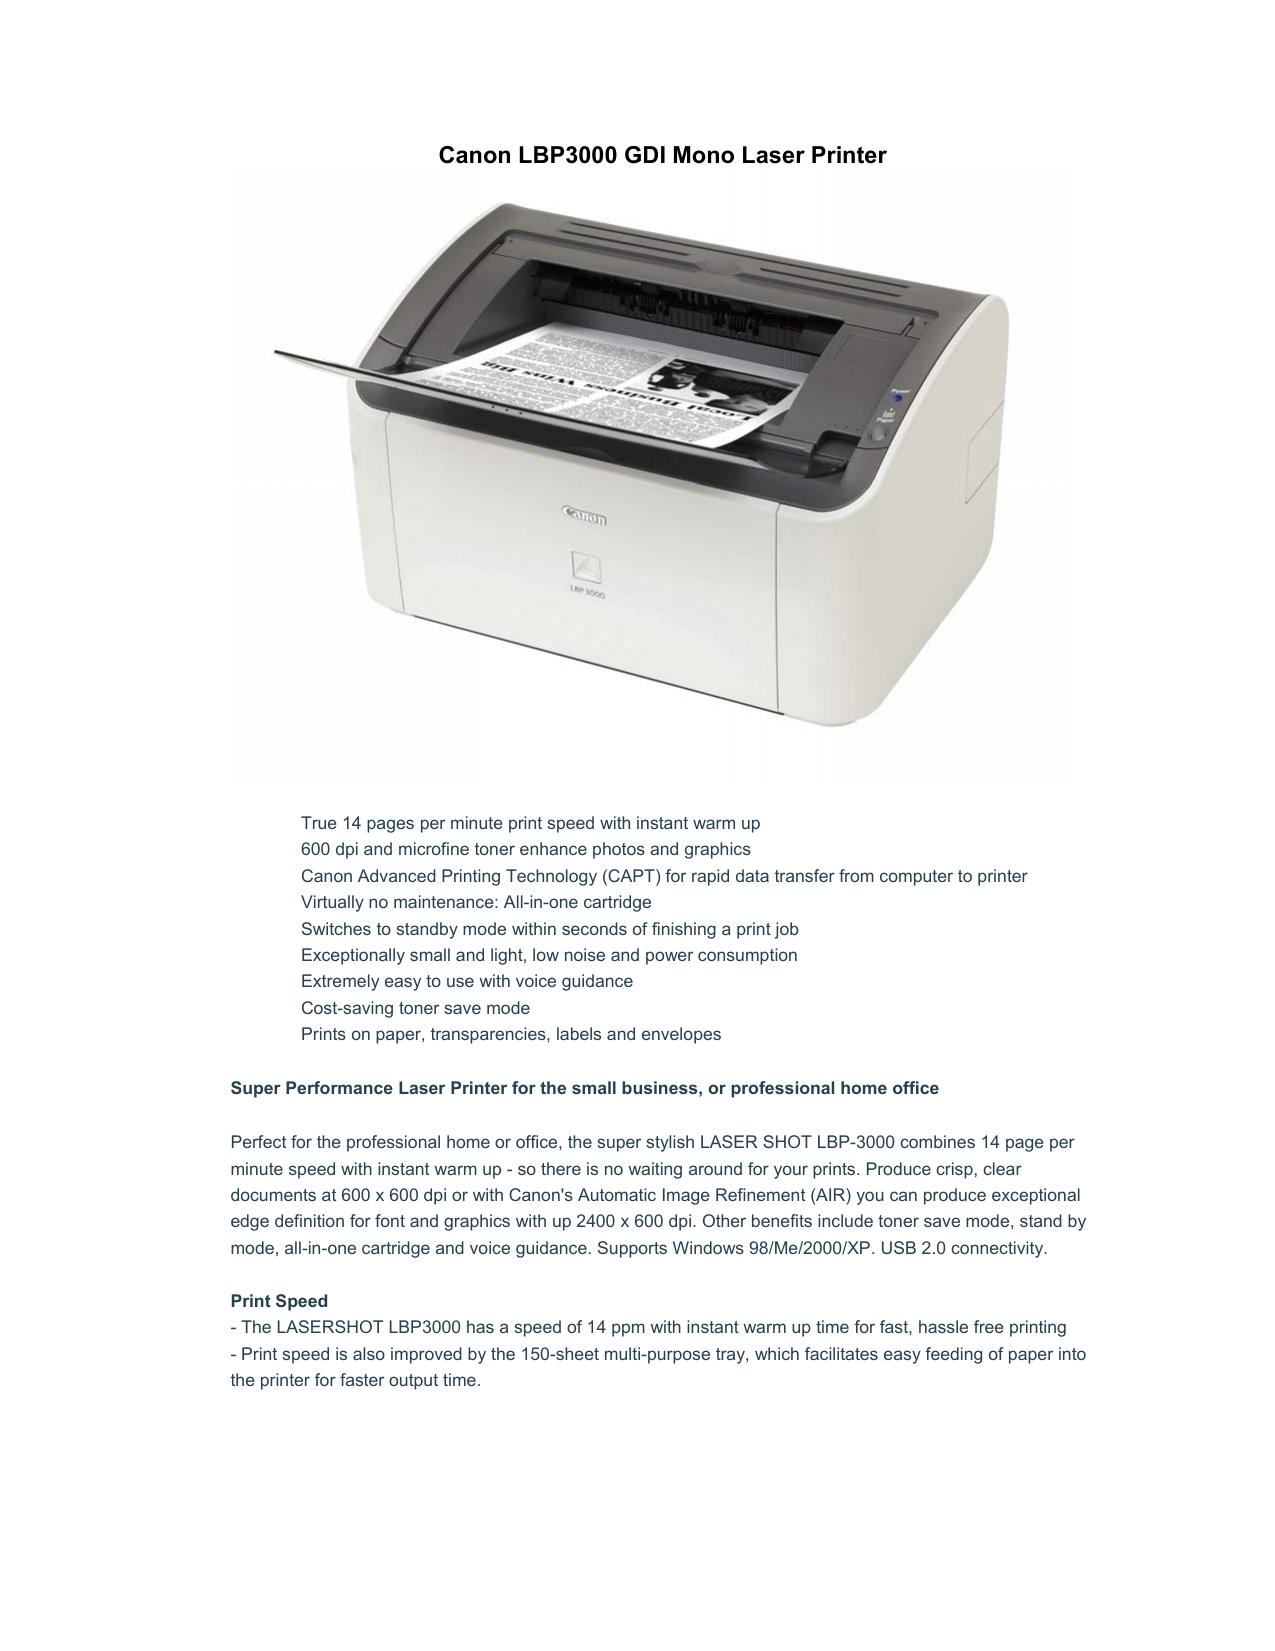 CANON LBP-810 AUTOMATIC IMAGE REFINEMENT DRIVERS FOR PC